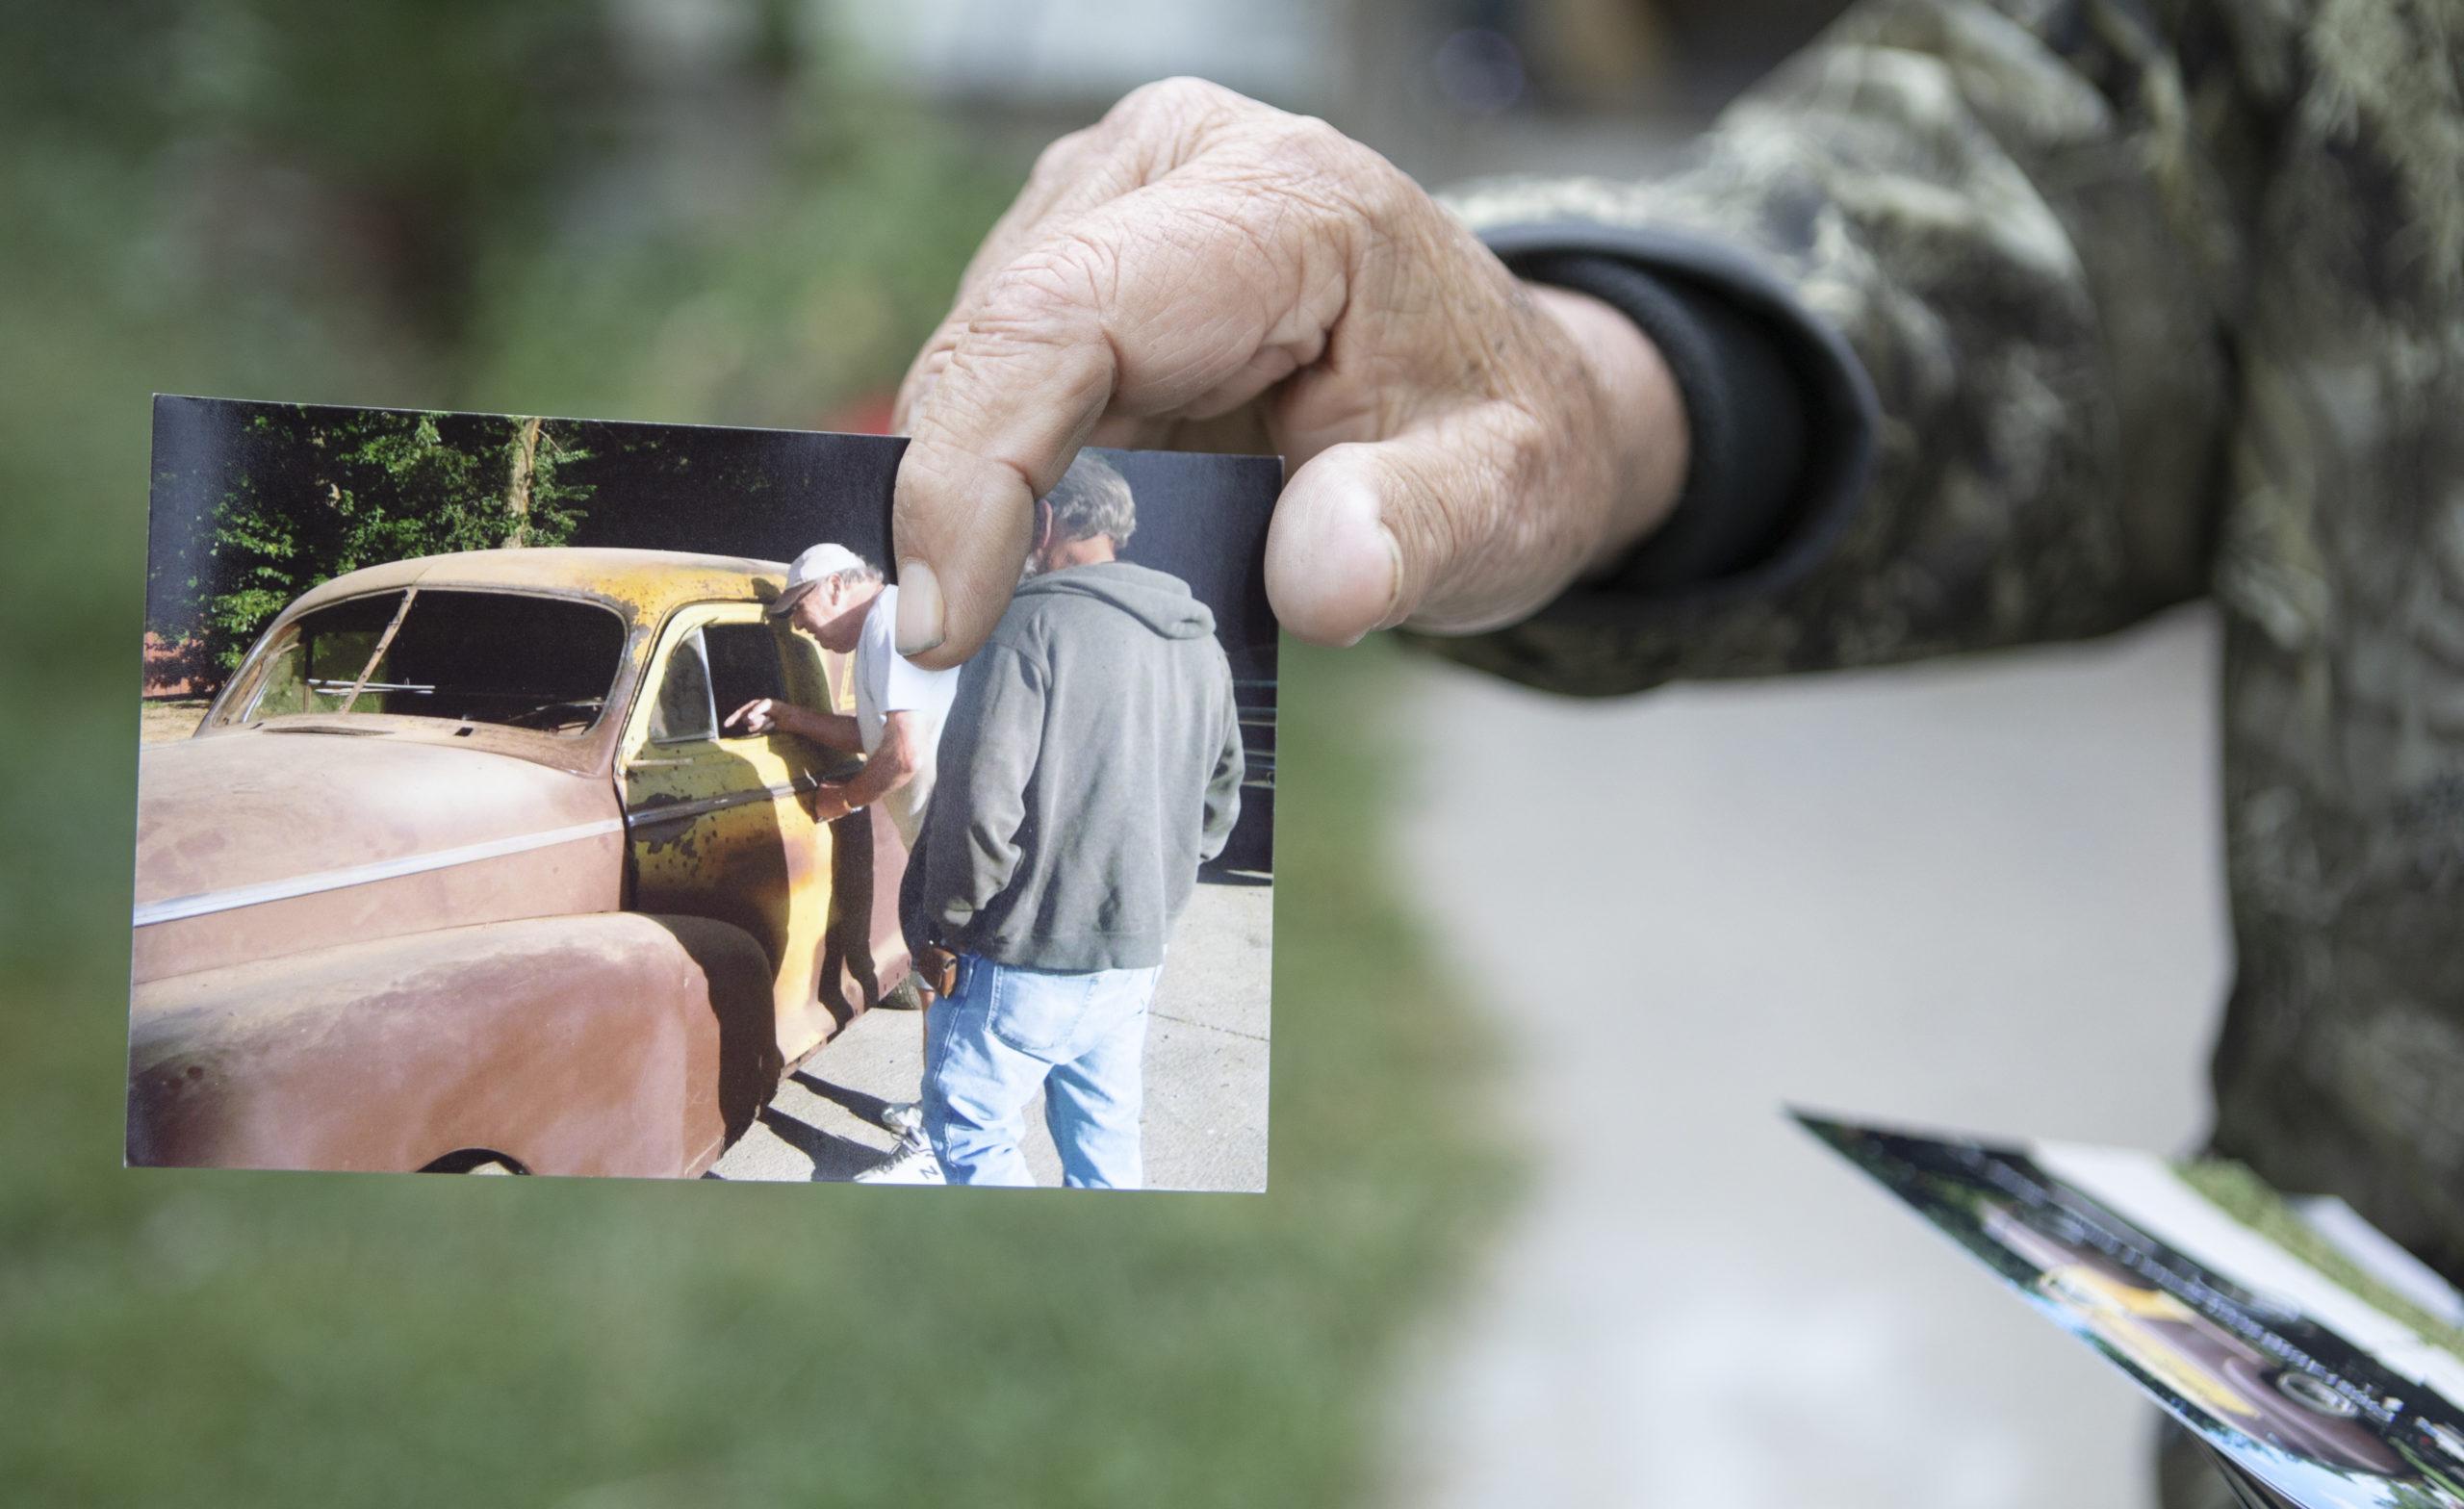 SamAugheFinal 5 1 scaled - Mobile Memorial: Sleepless night creates veteran memorial